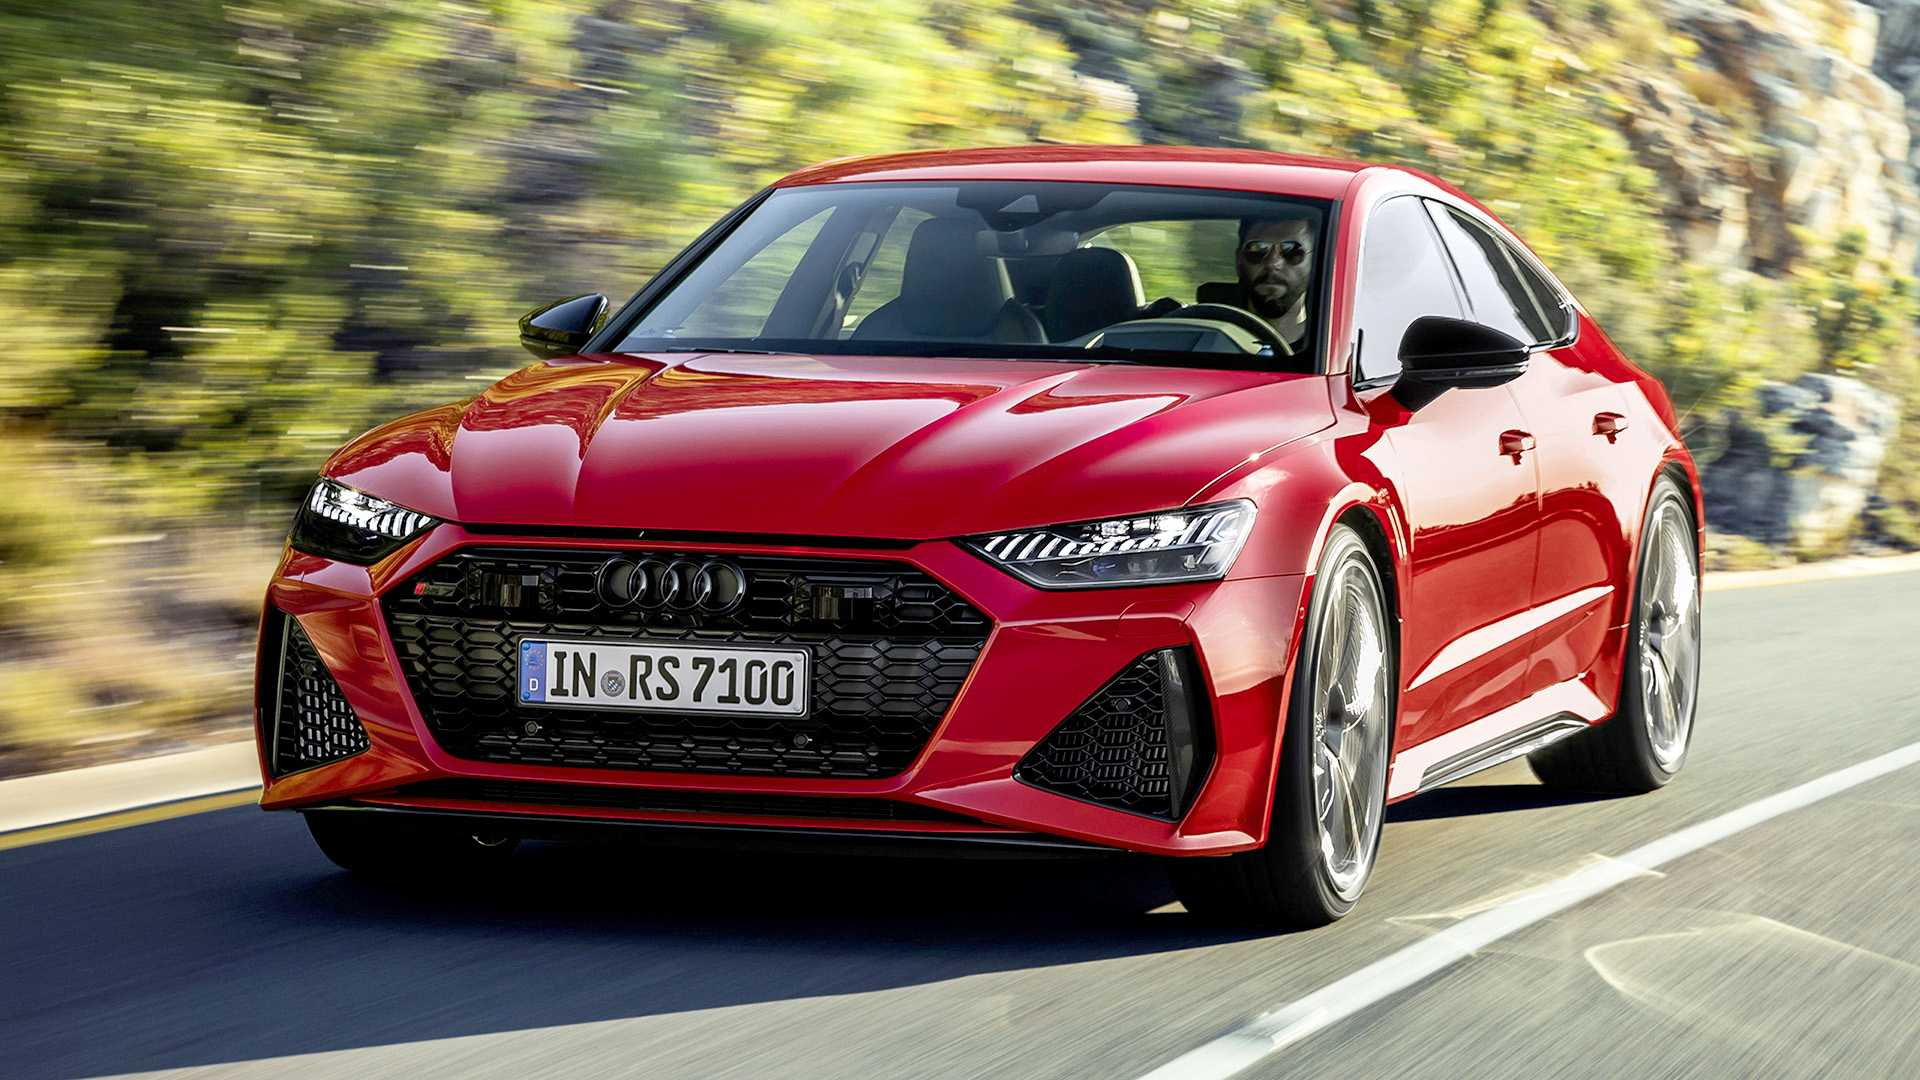 (Video) IAA 2019 - Audi